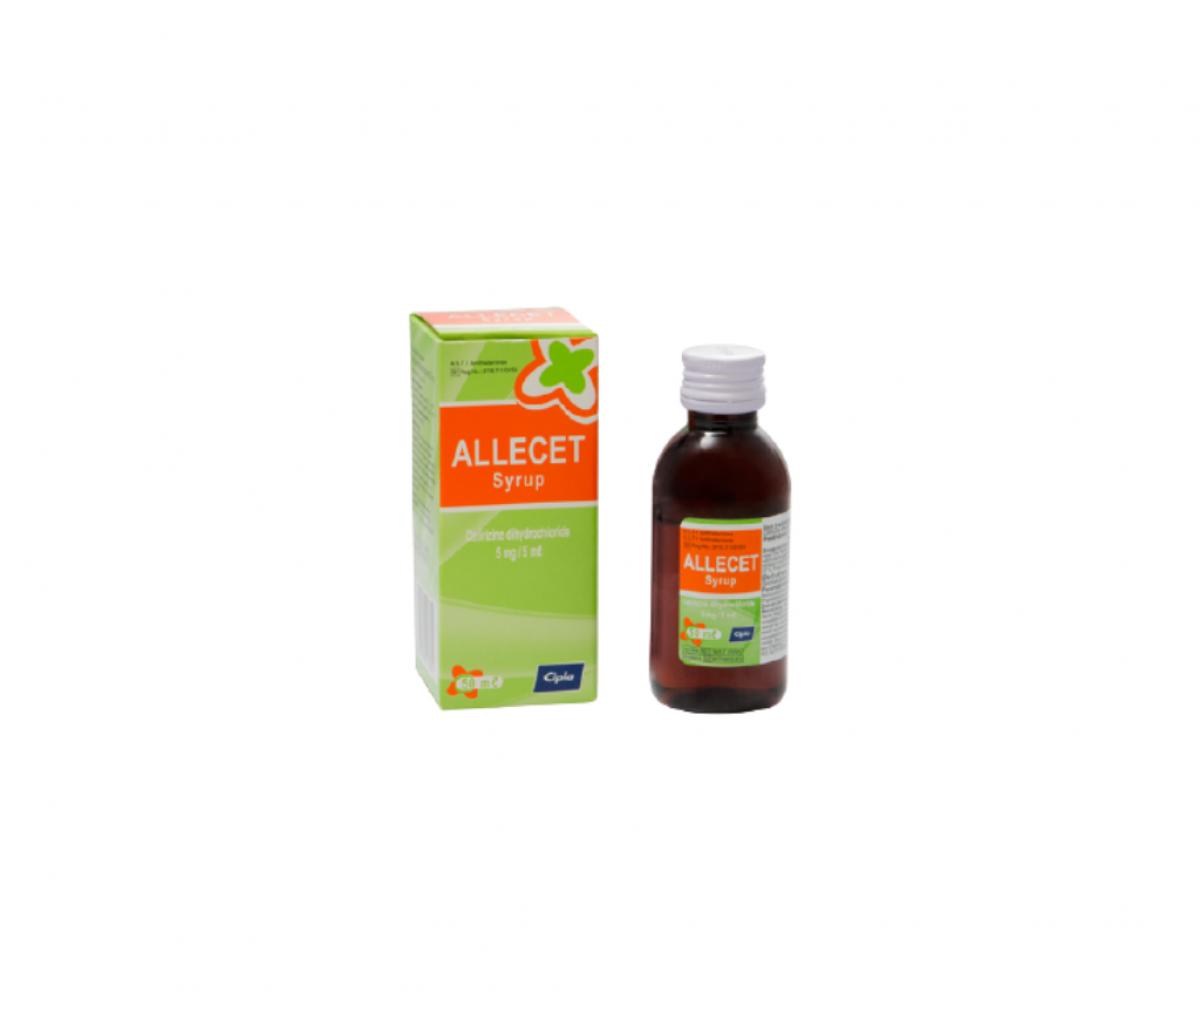 Allercet 5mg Oral Liquid